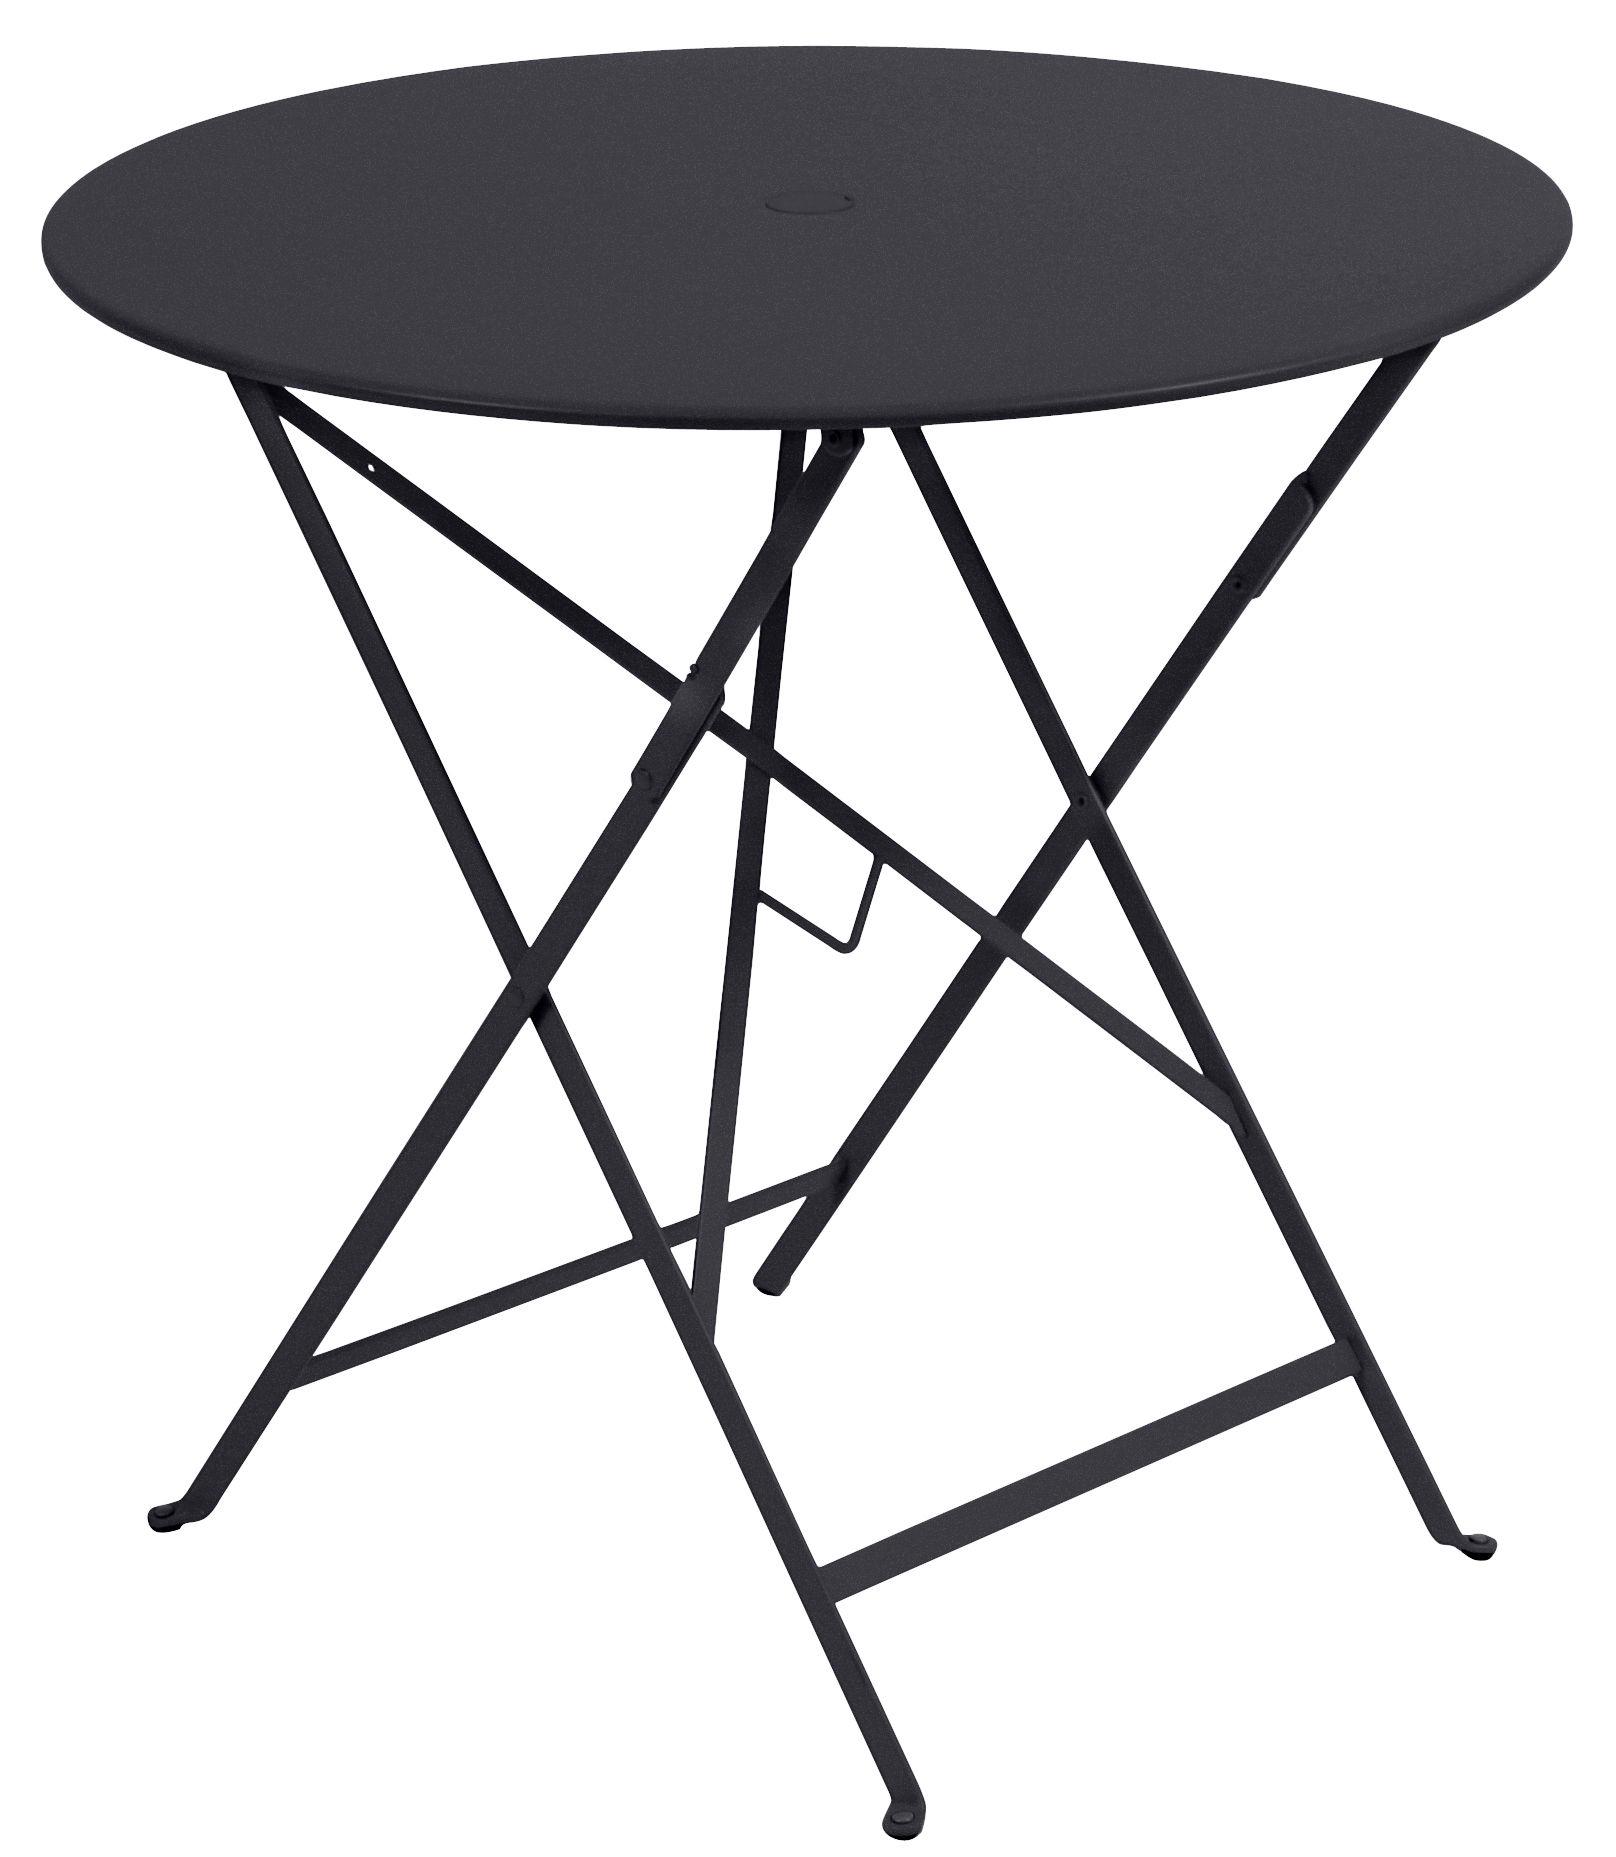 Outdoor - Tables de jardin - Table pliante Bistro / Ø 77cm - Trou pour parasol - Fermob - Carbone - Acier laqué